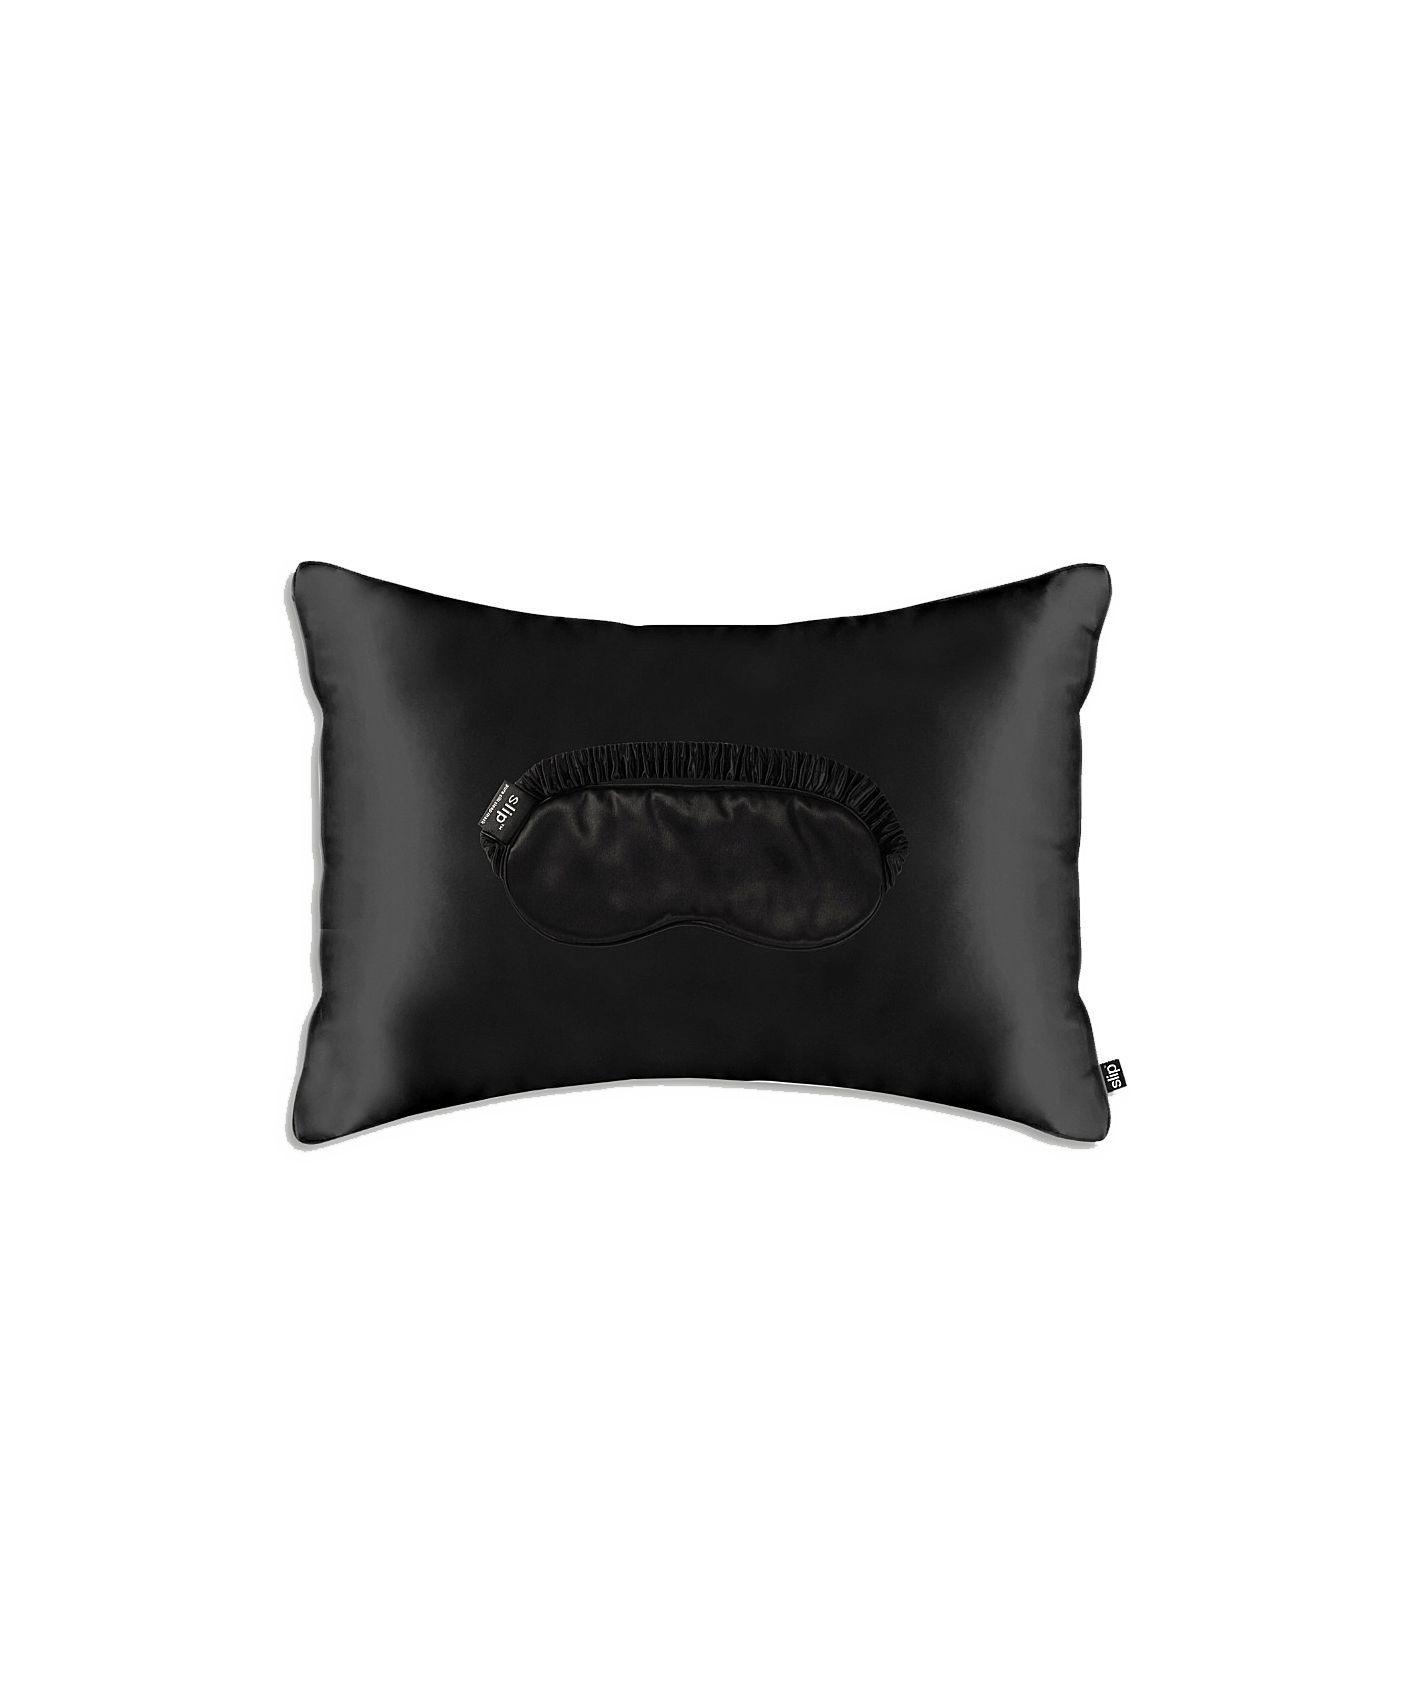 Pillow Adventure Travel Company Ltd